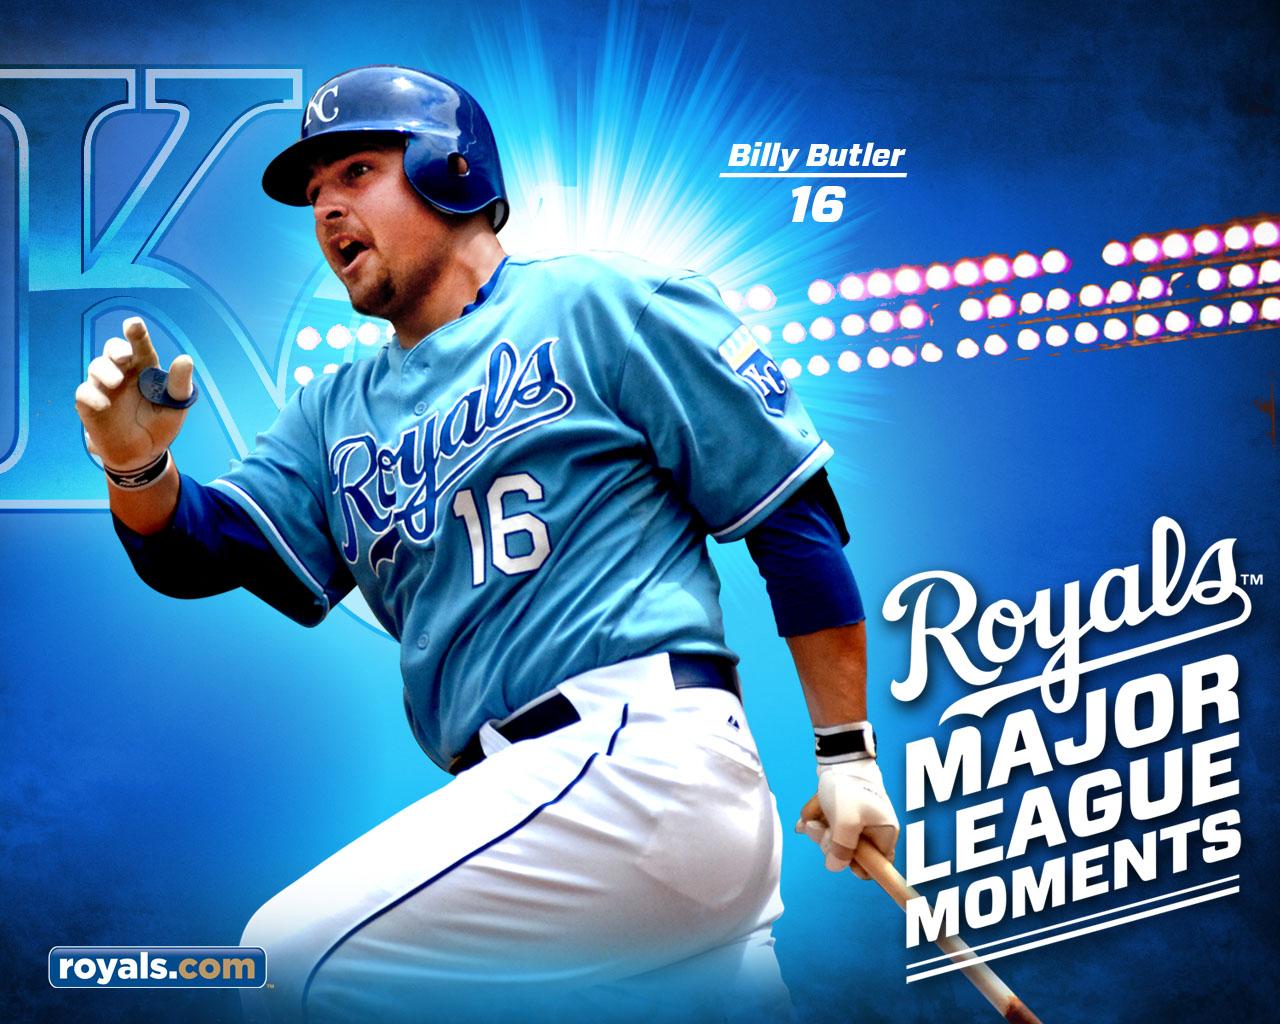 Kansas City Royals Wallpapers Browser Themes More 1280x1024